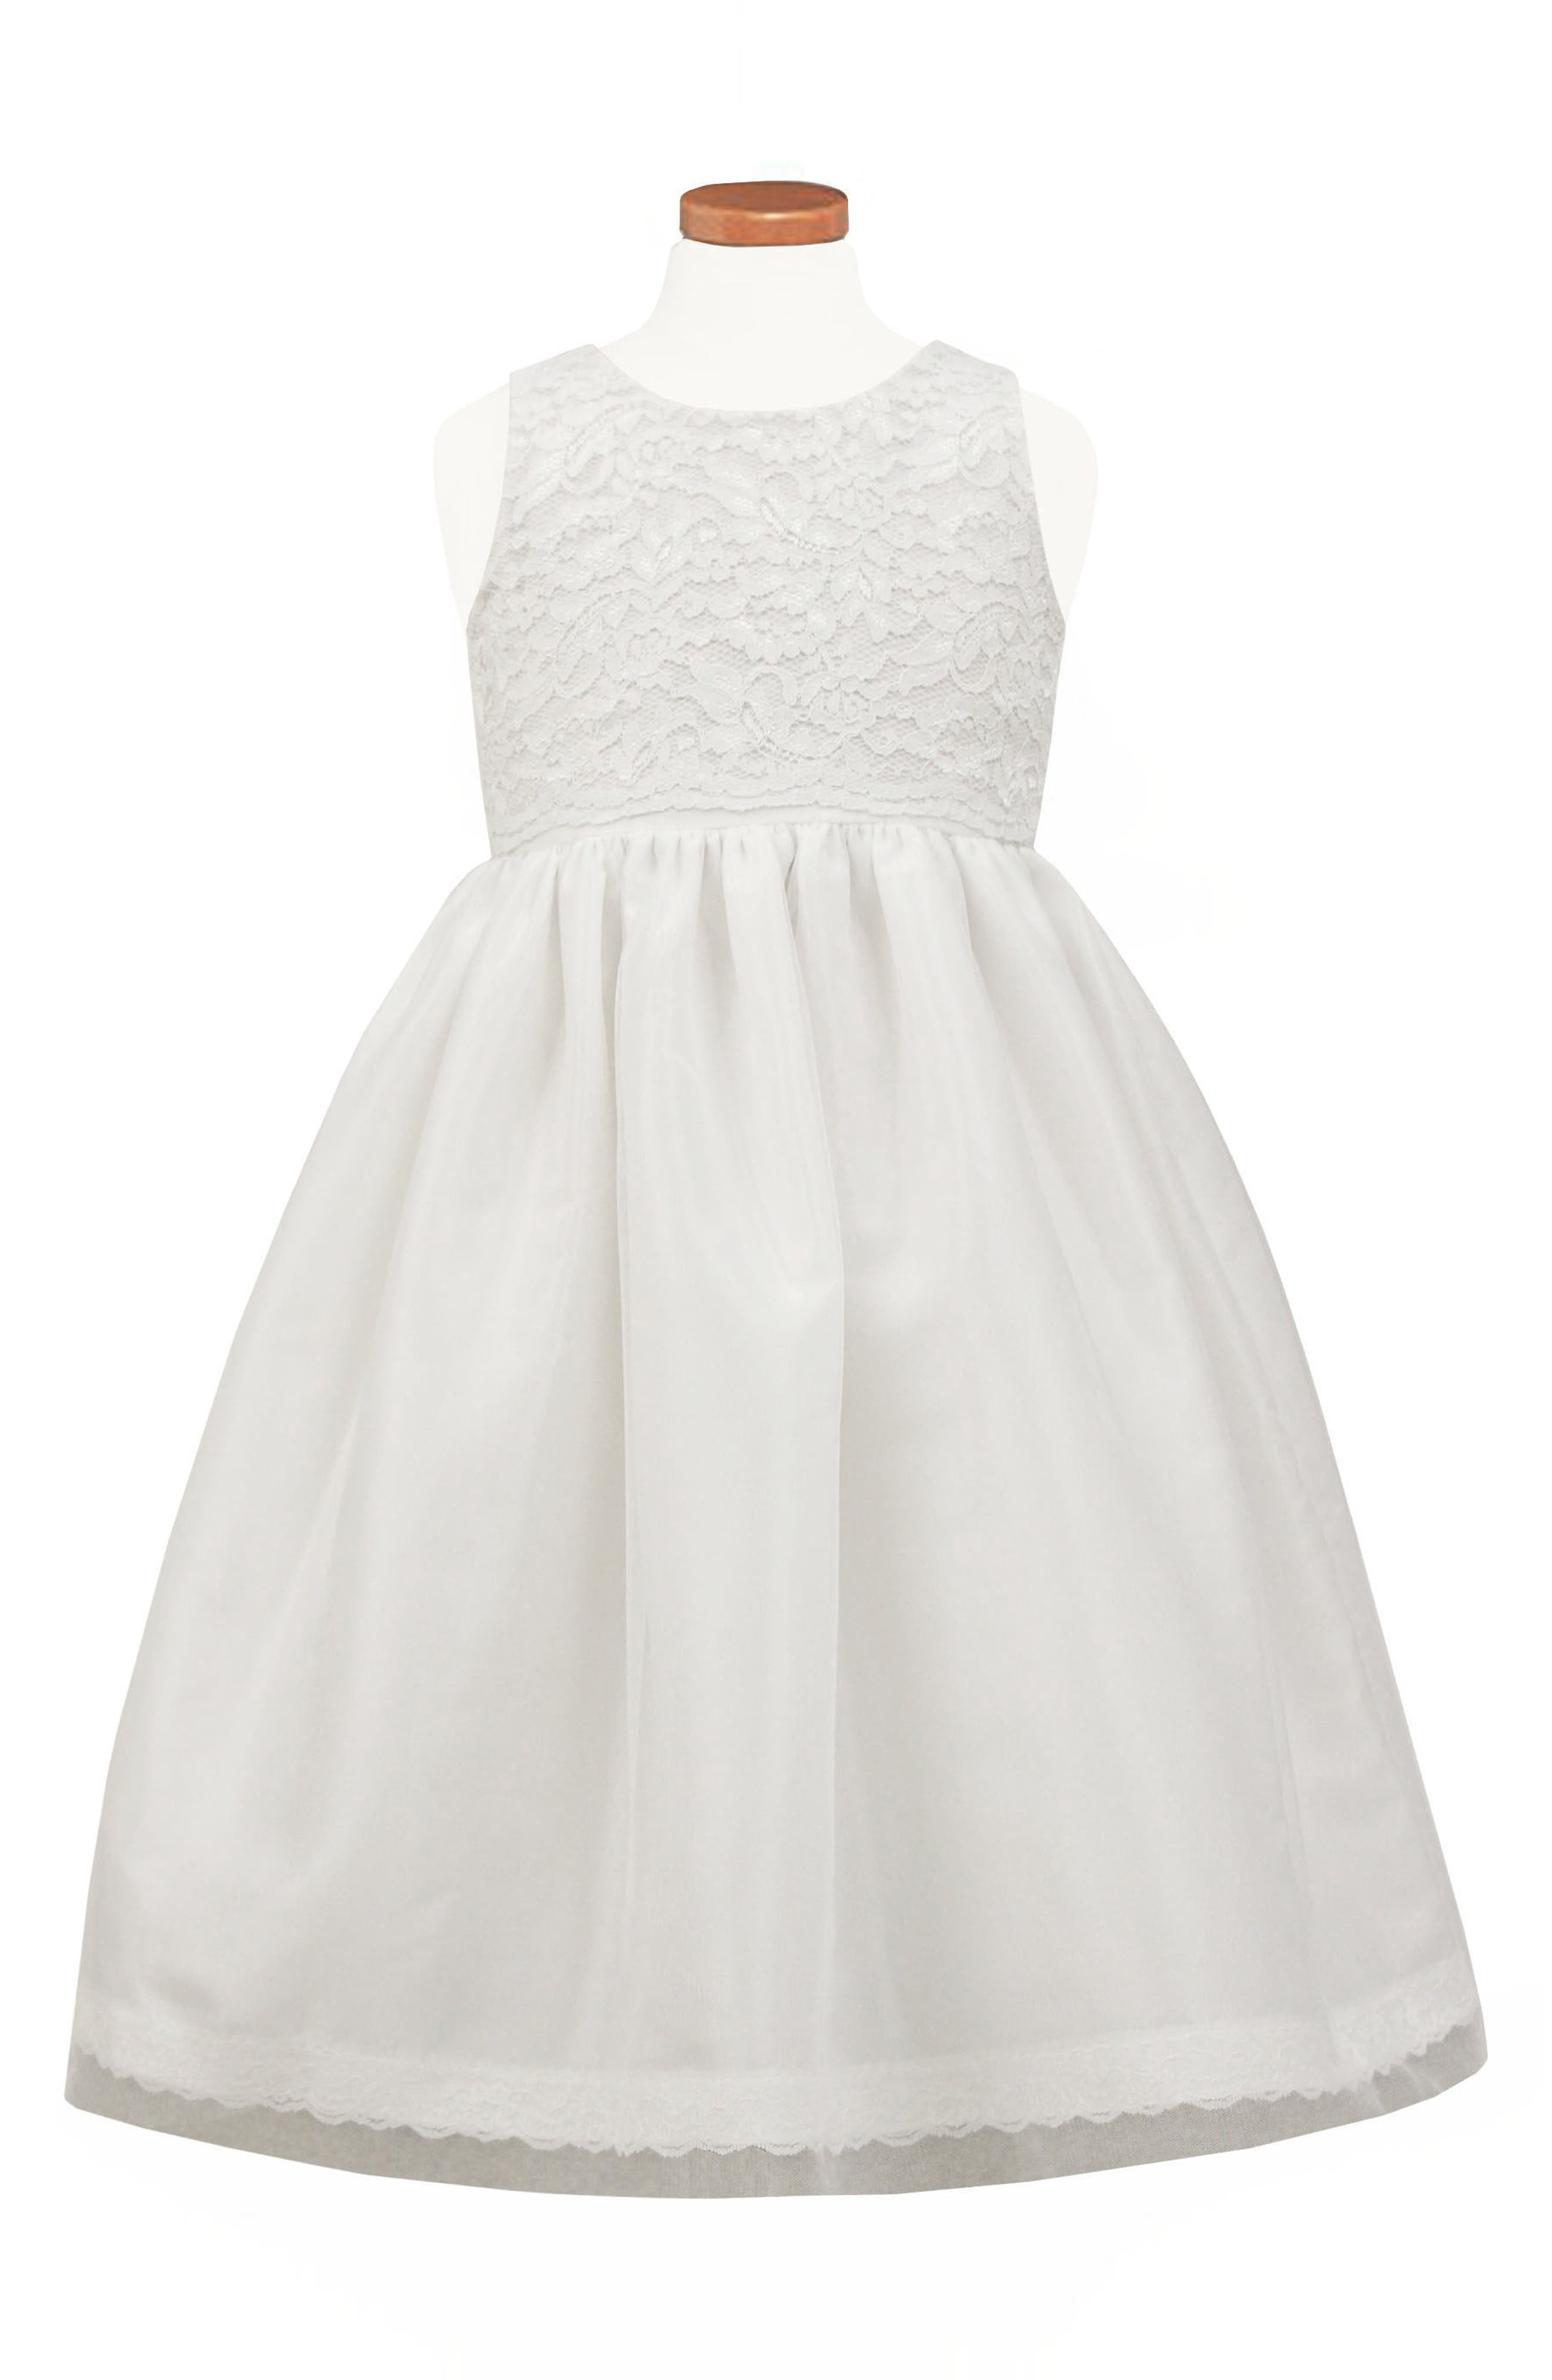 Lace Fit & Flare Dress,                             Main thumbnail 1, color,                             White